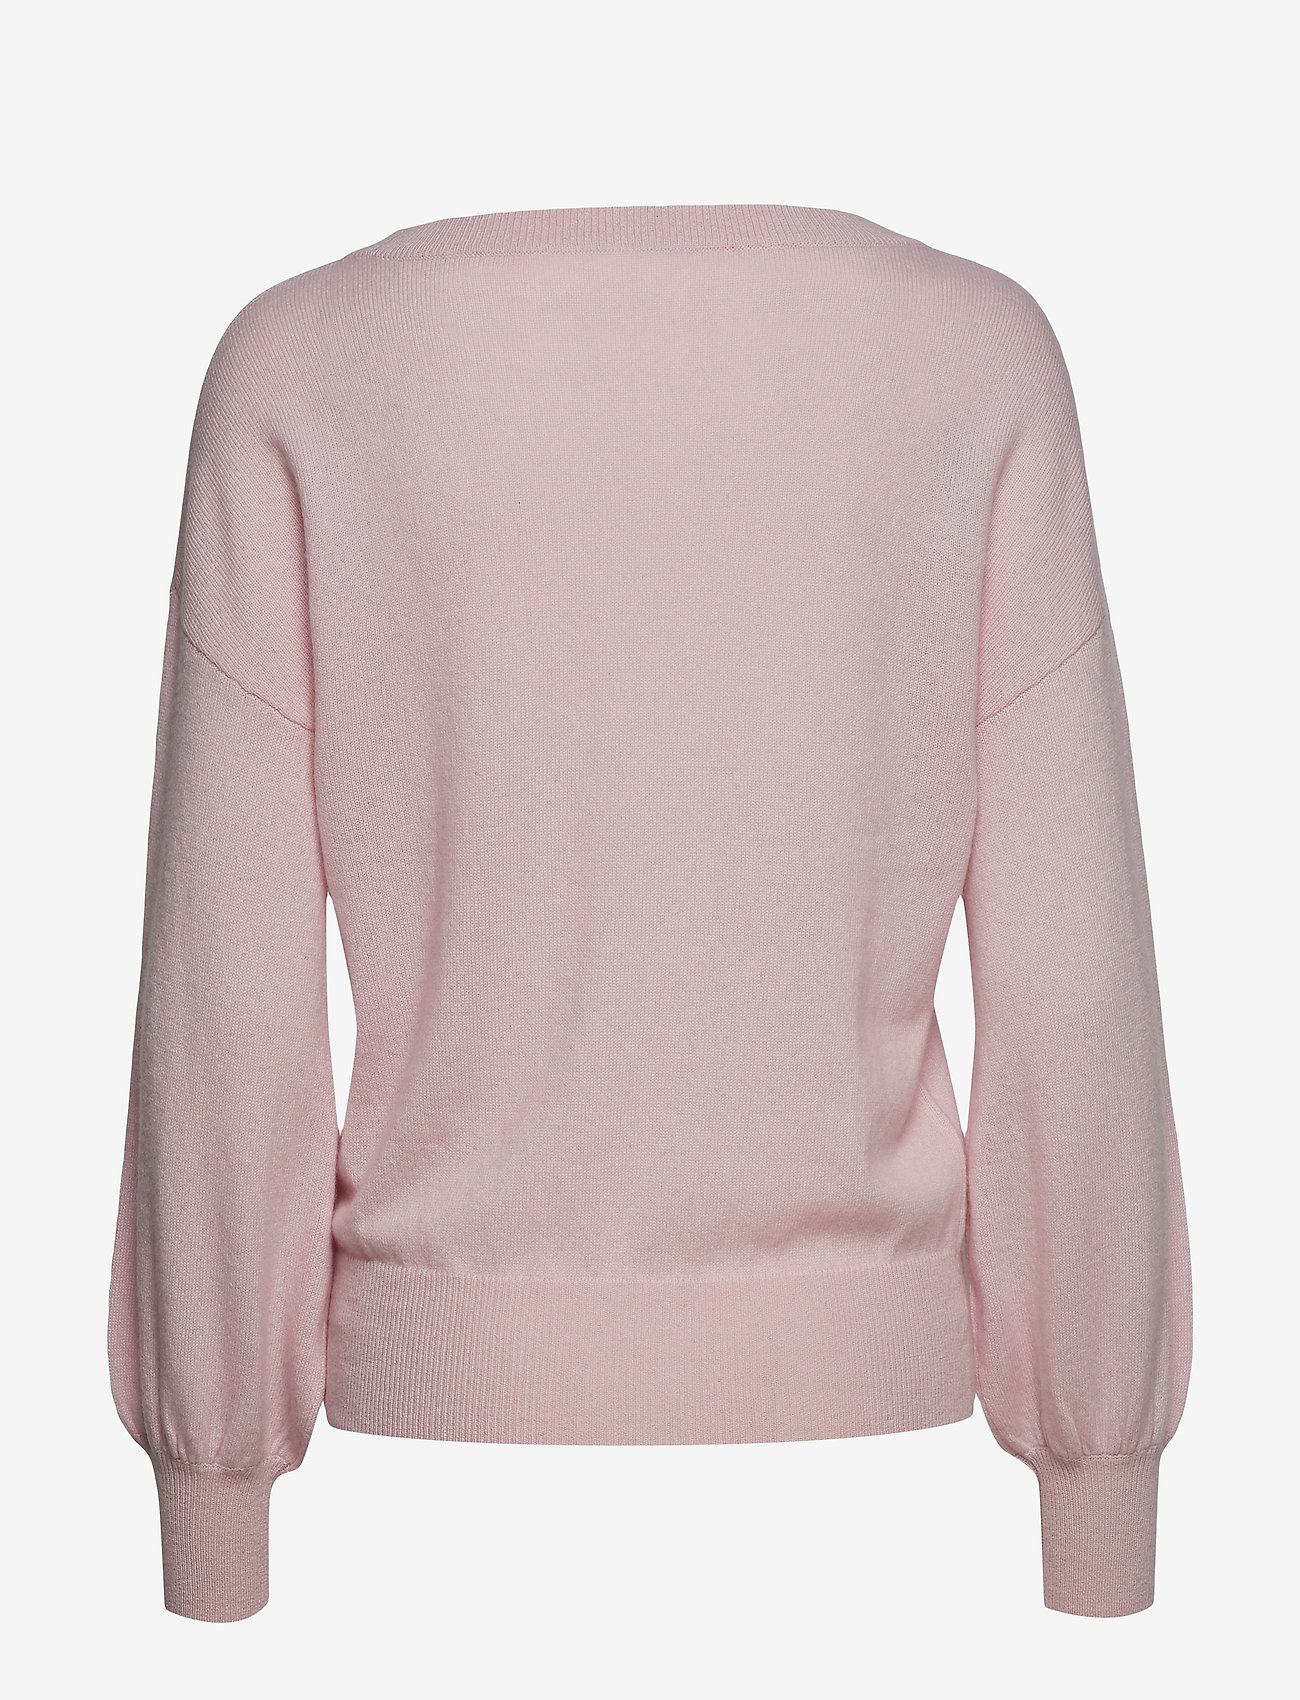 Balloon Sleeve Sweater  - Davida Cashmere